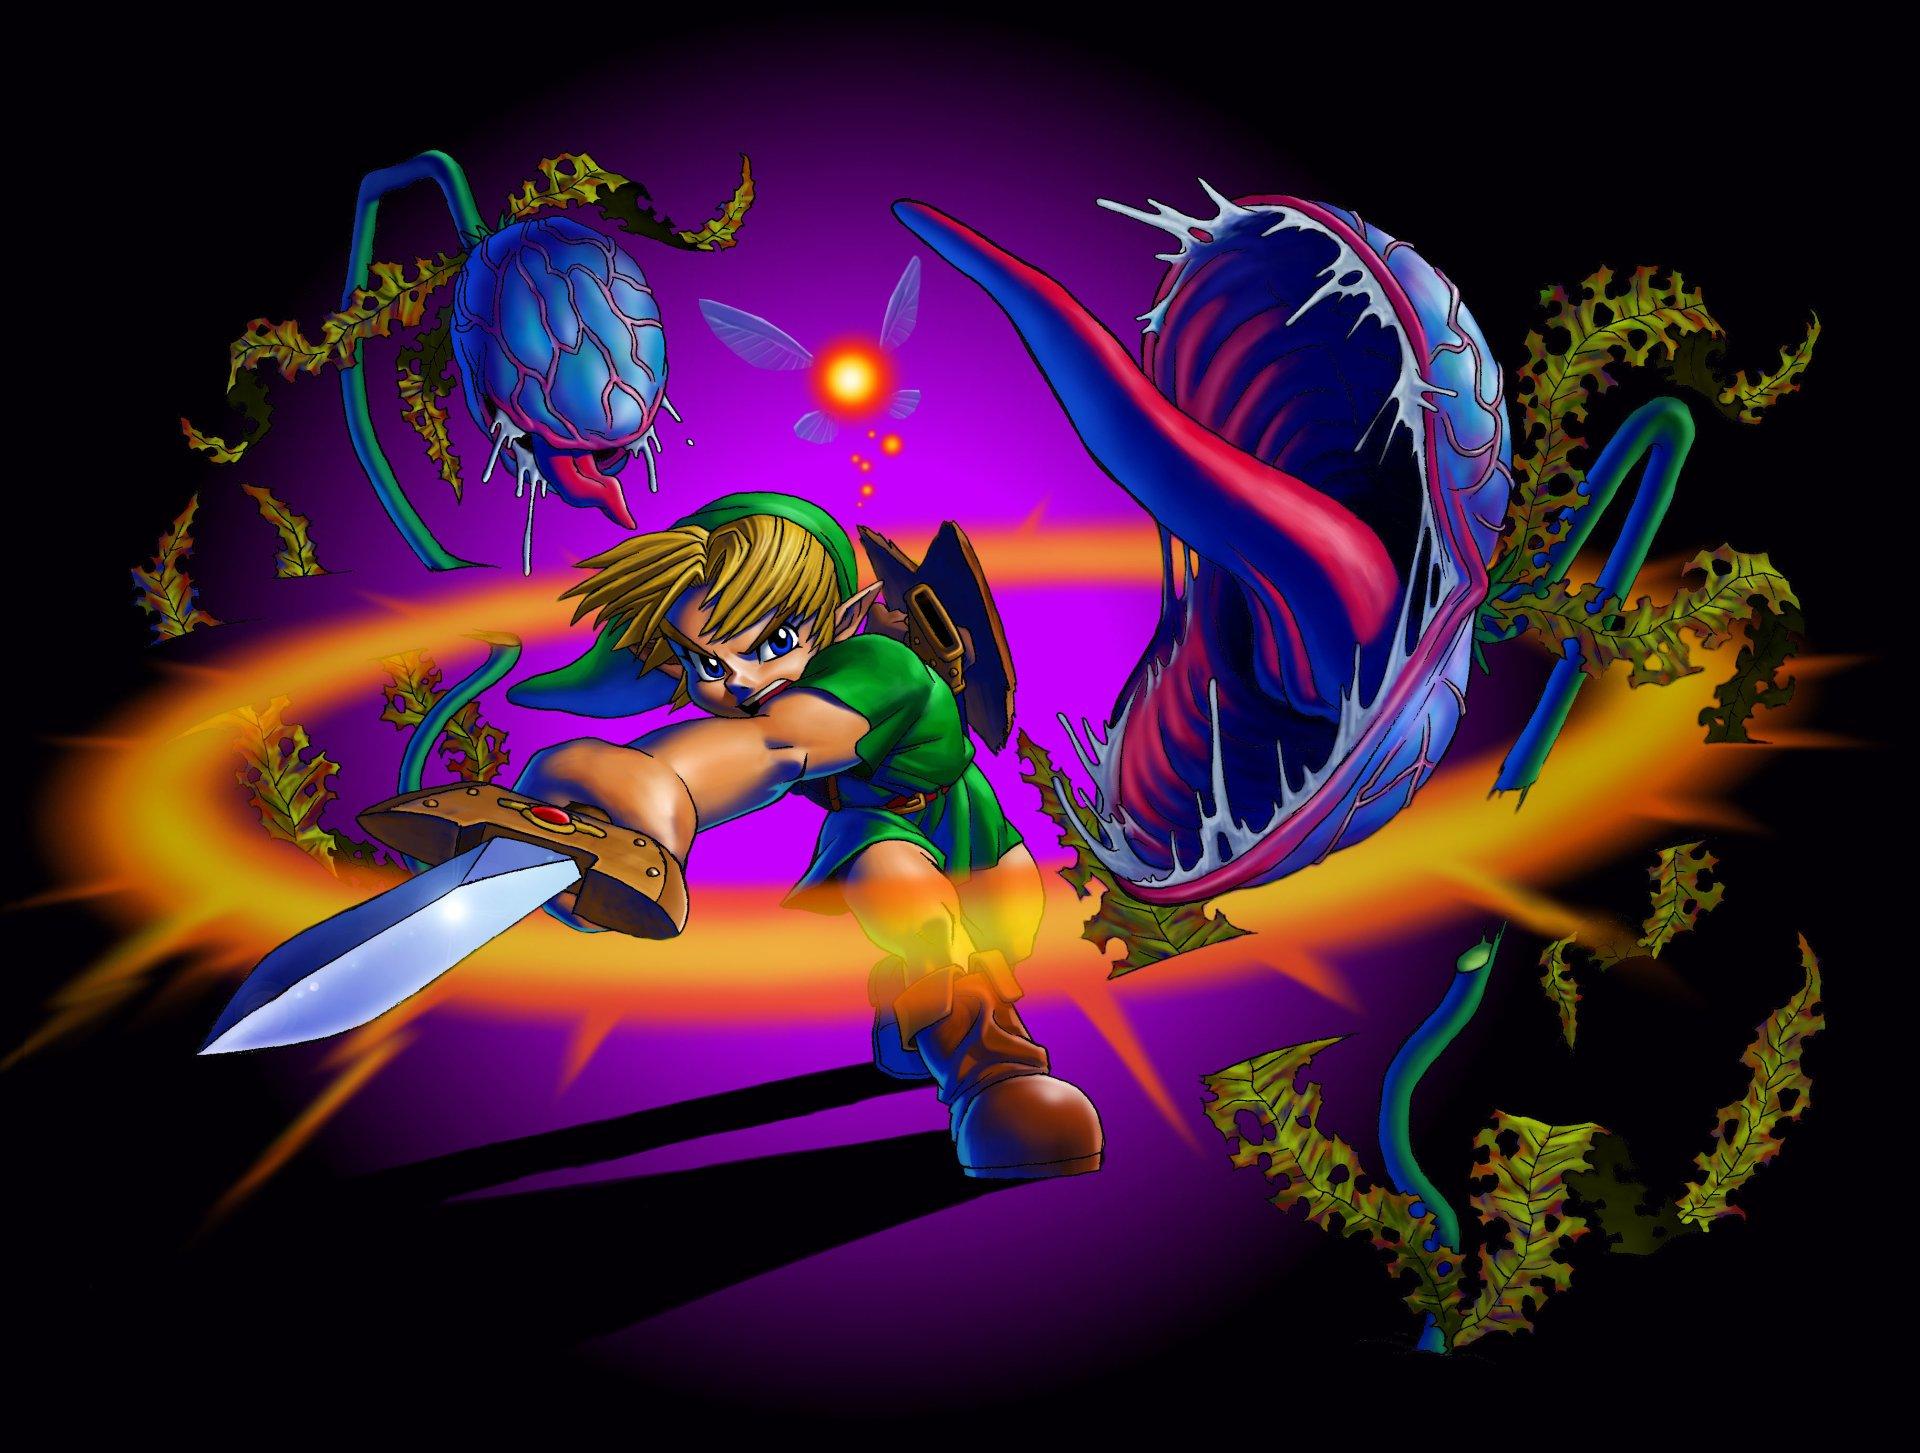 Jeux Vidéo - The Legend Of Zelda: Ocarina Of Time  Link Fond d'écran